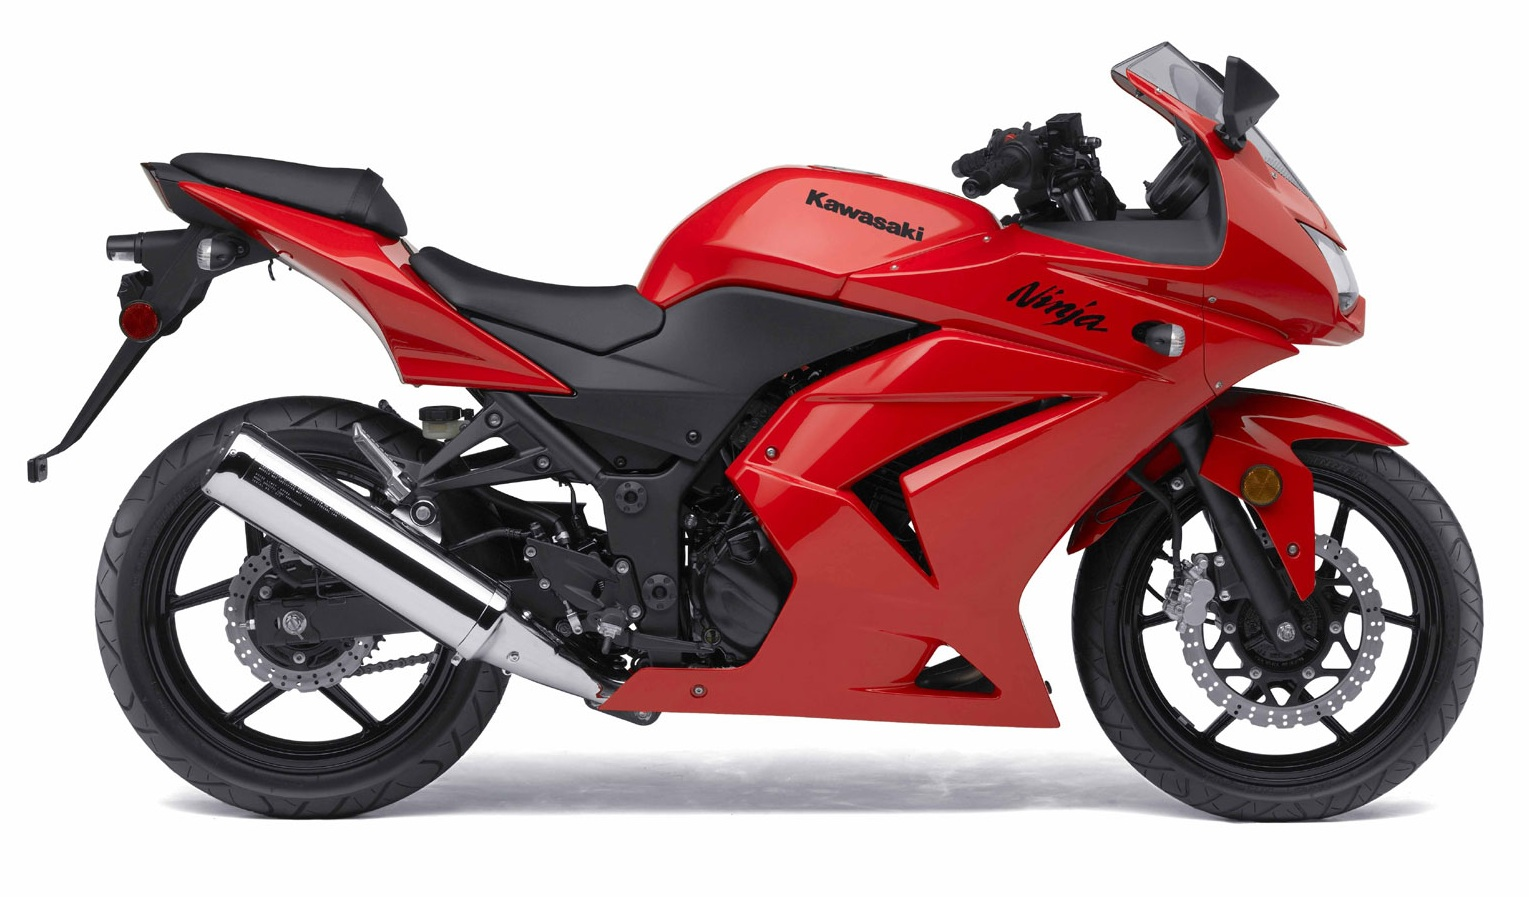 Kawasaki Ninja 150 RR Image